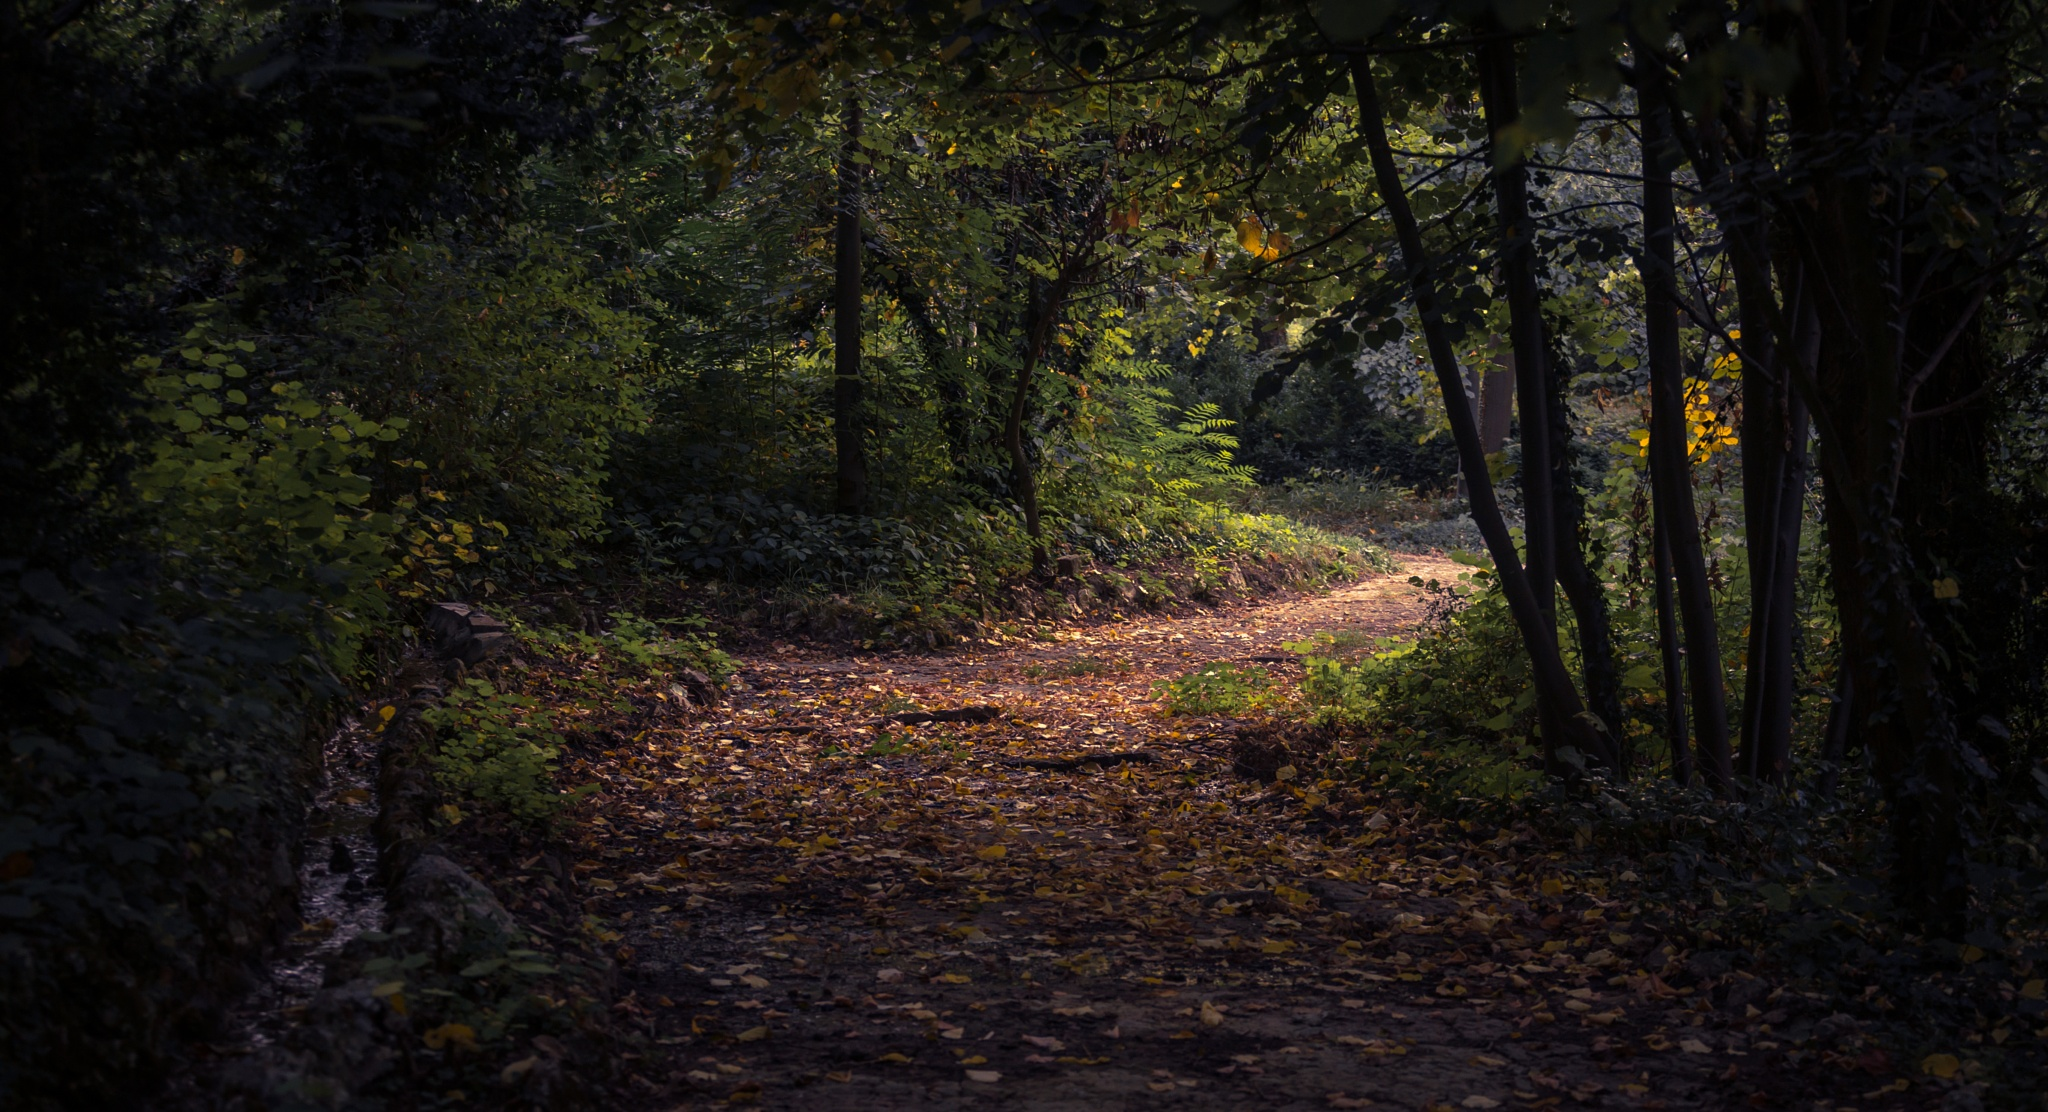 Mystery Forest by Anton Atanasov